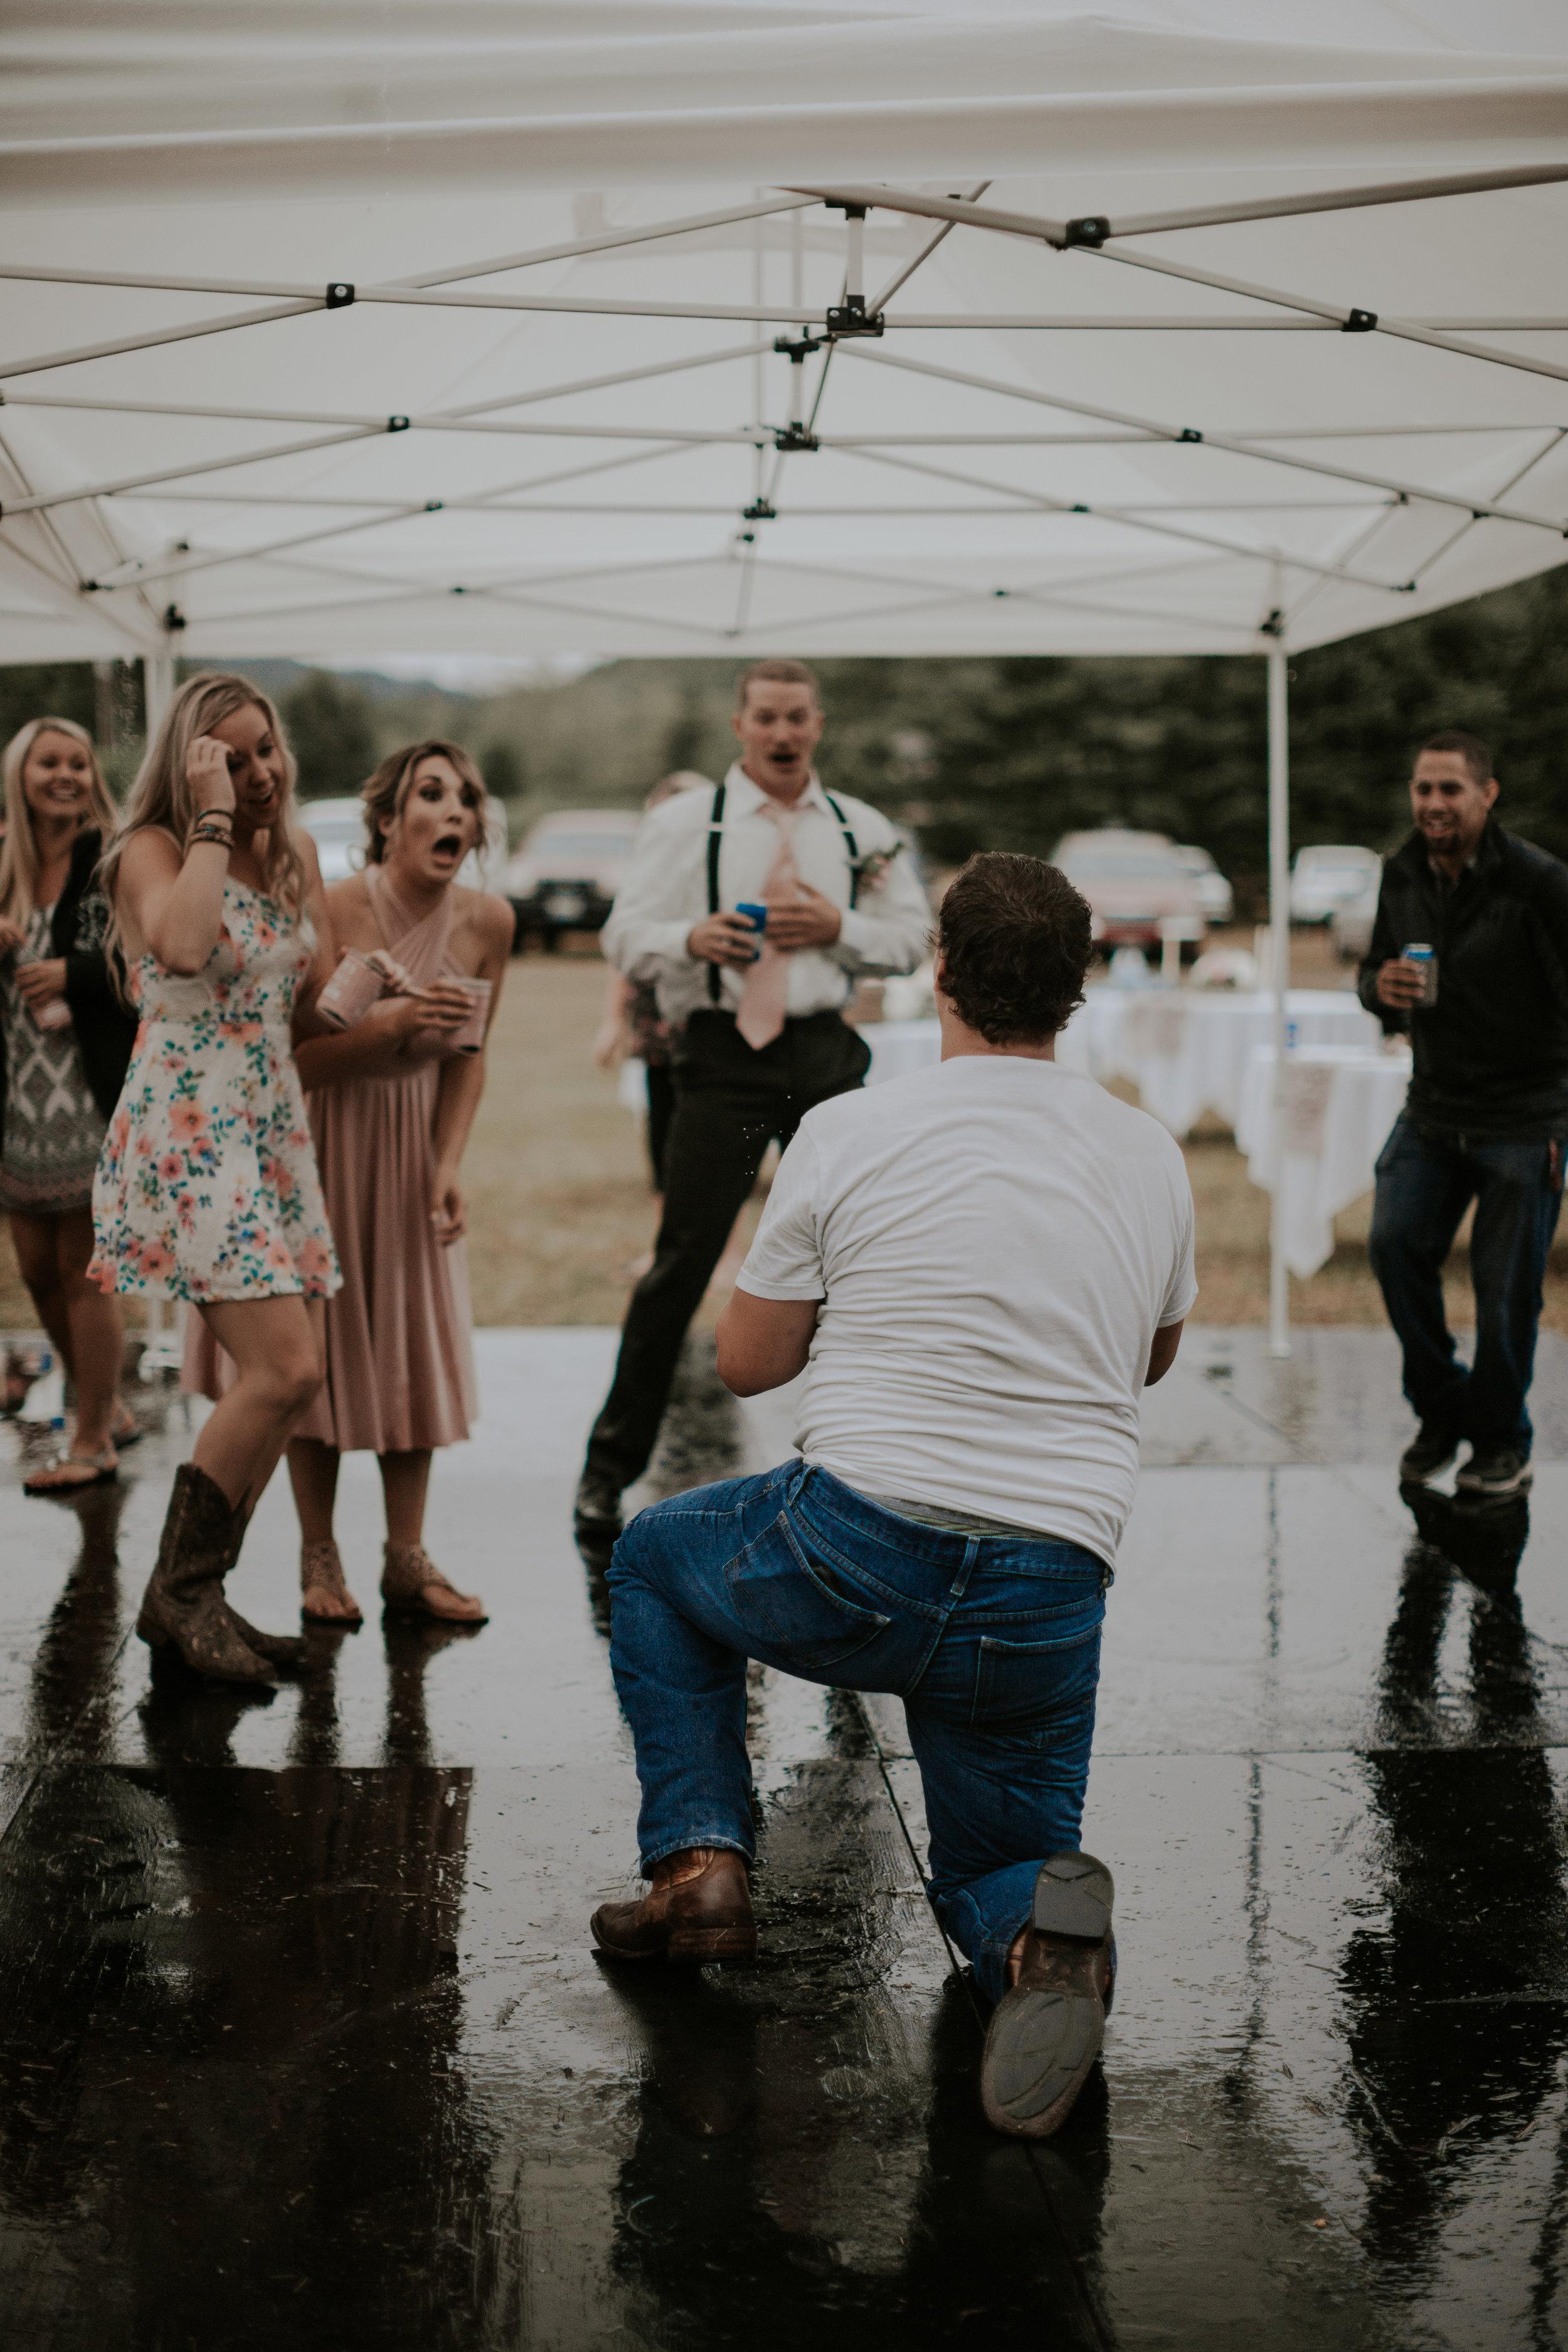 Olympic-Peninsula-Wedding-Photographer-PNW-Forks-Port-Angeles-Kayla-Dawn-Photography-engagement-Olympic-National-Park-248.jpg